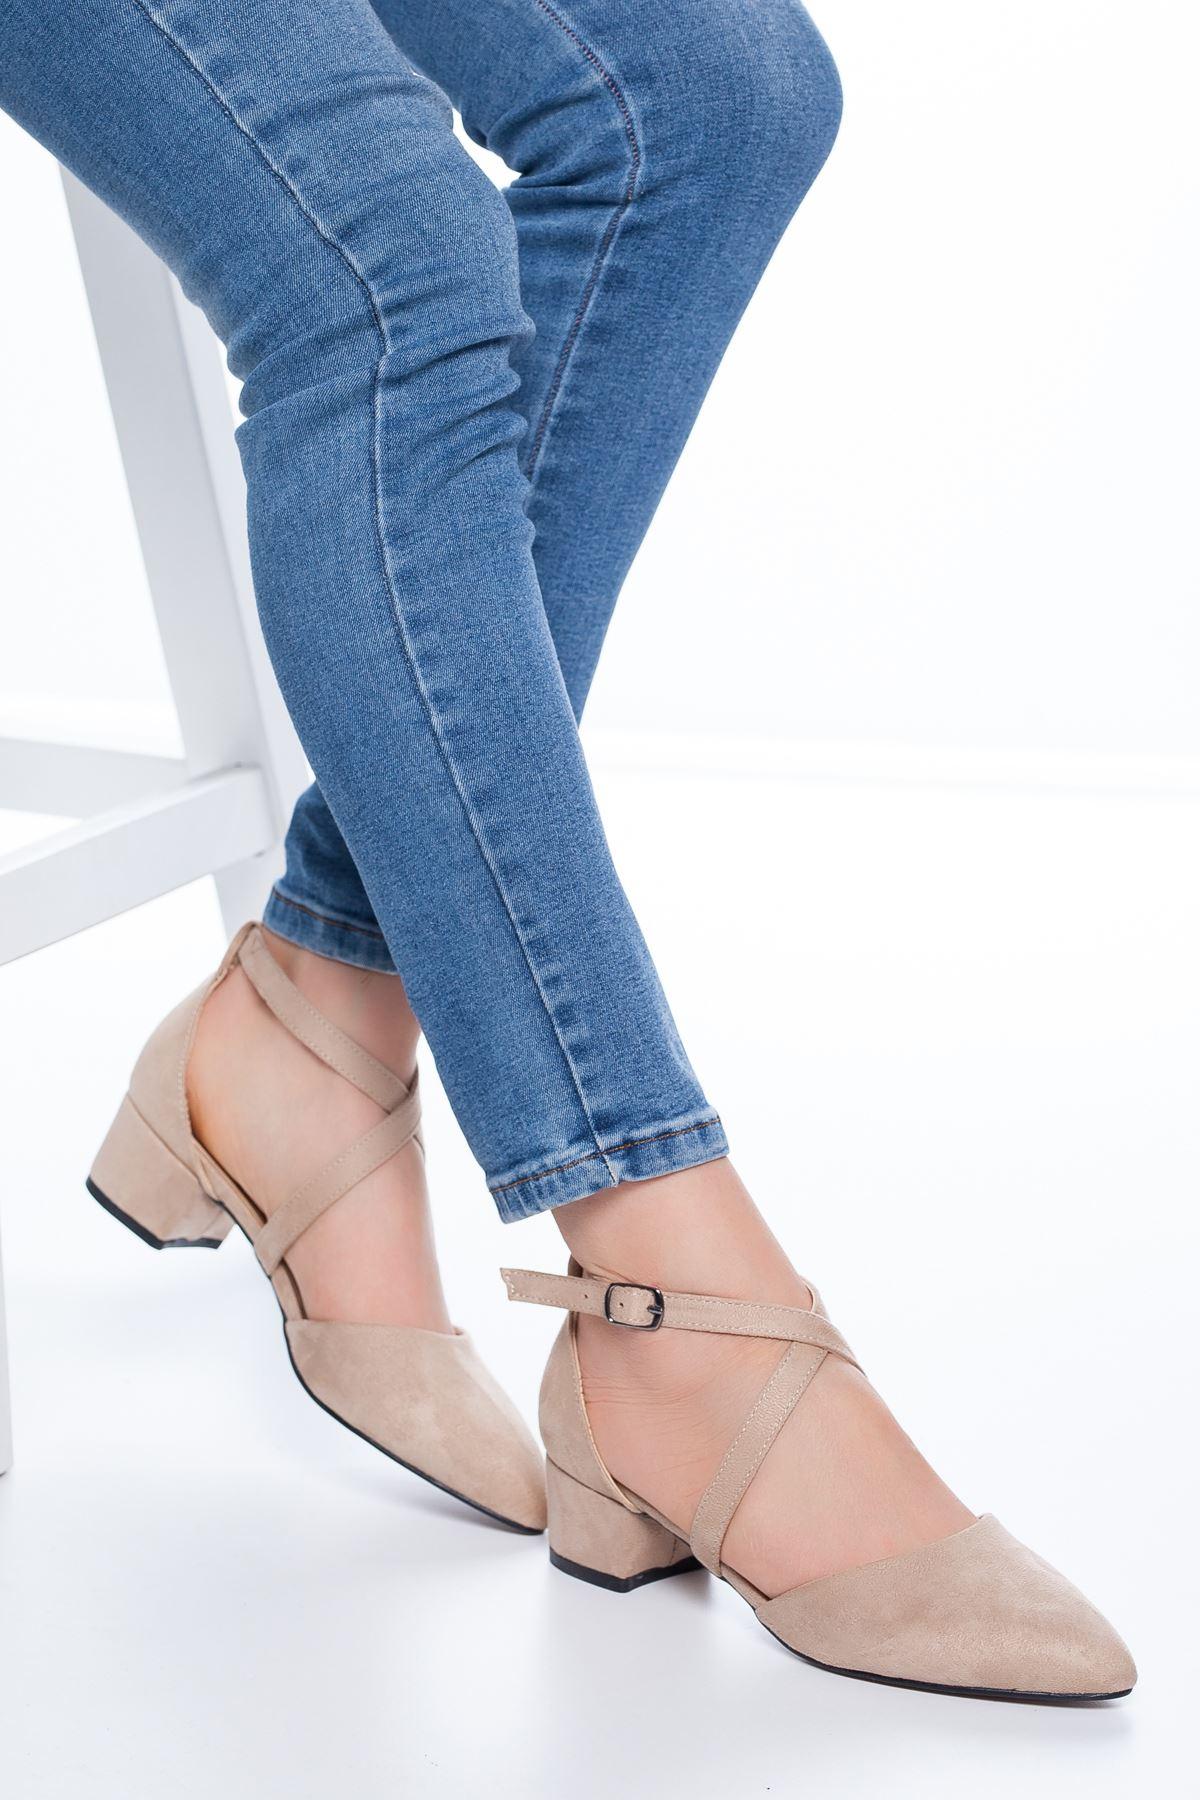 Lexon Topuklu Süet Ayakkabı Ten